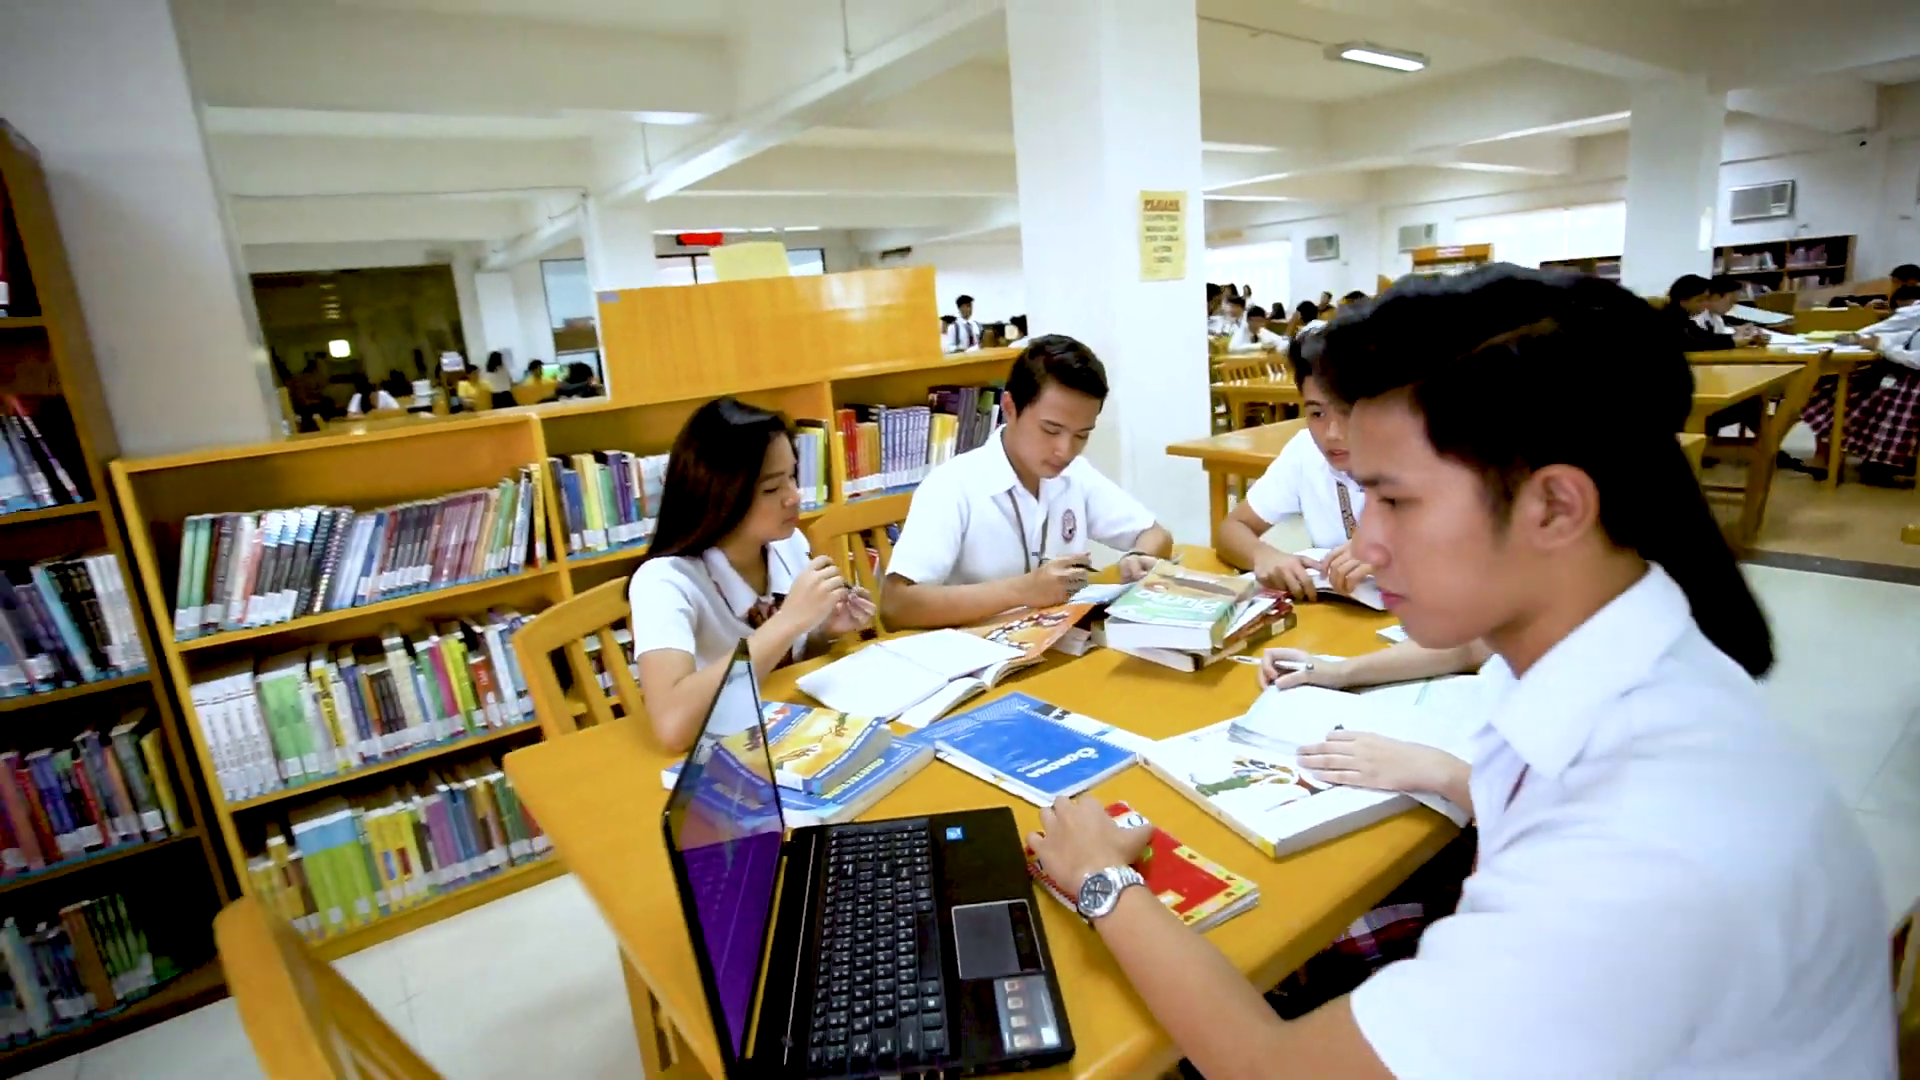 UV Gullas Classrooms